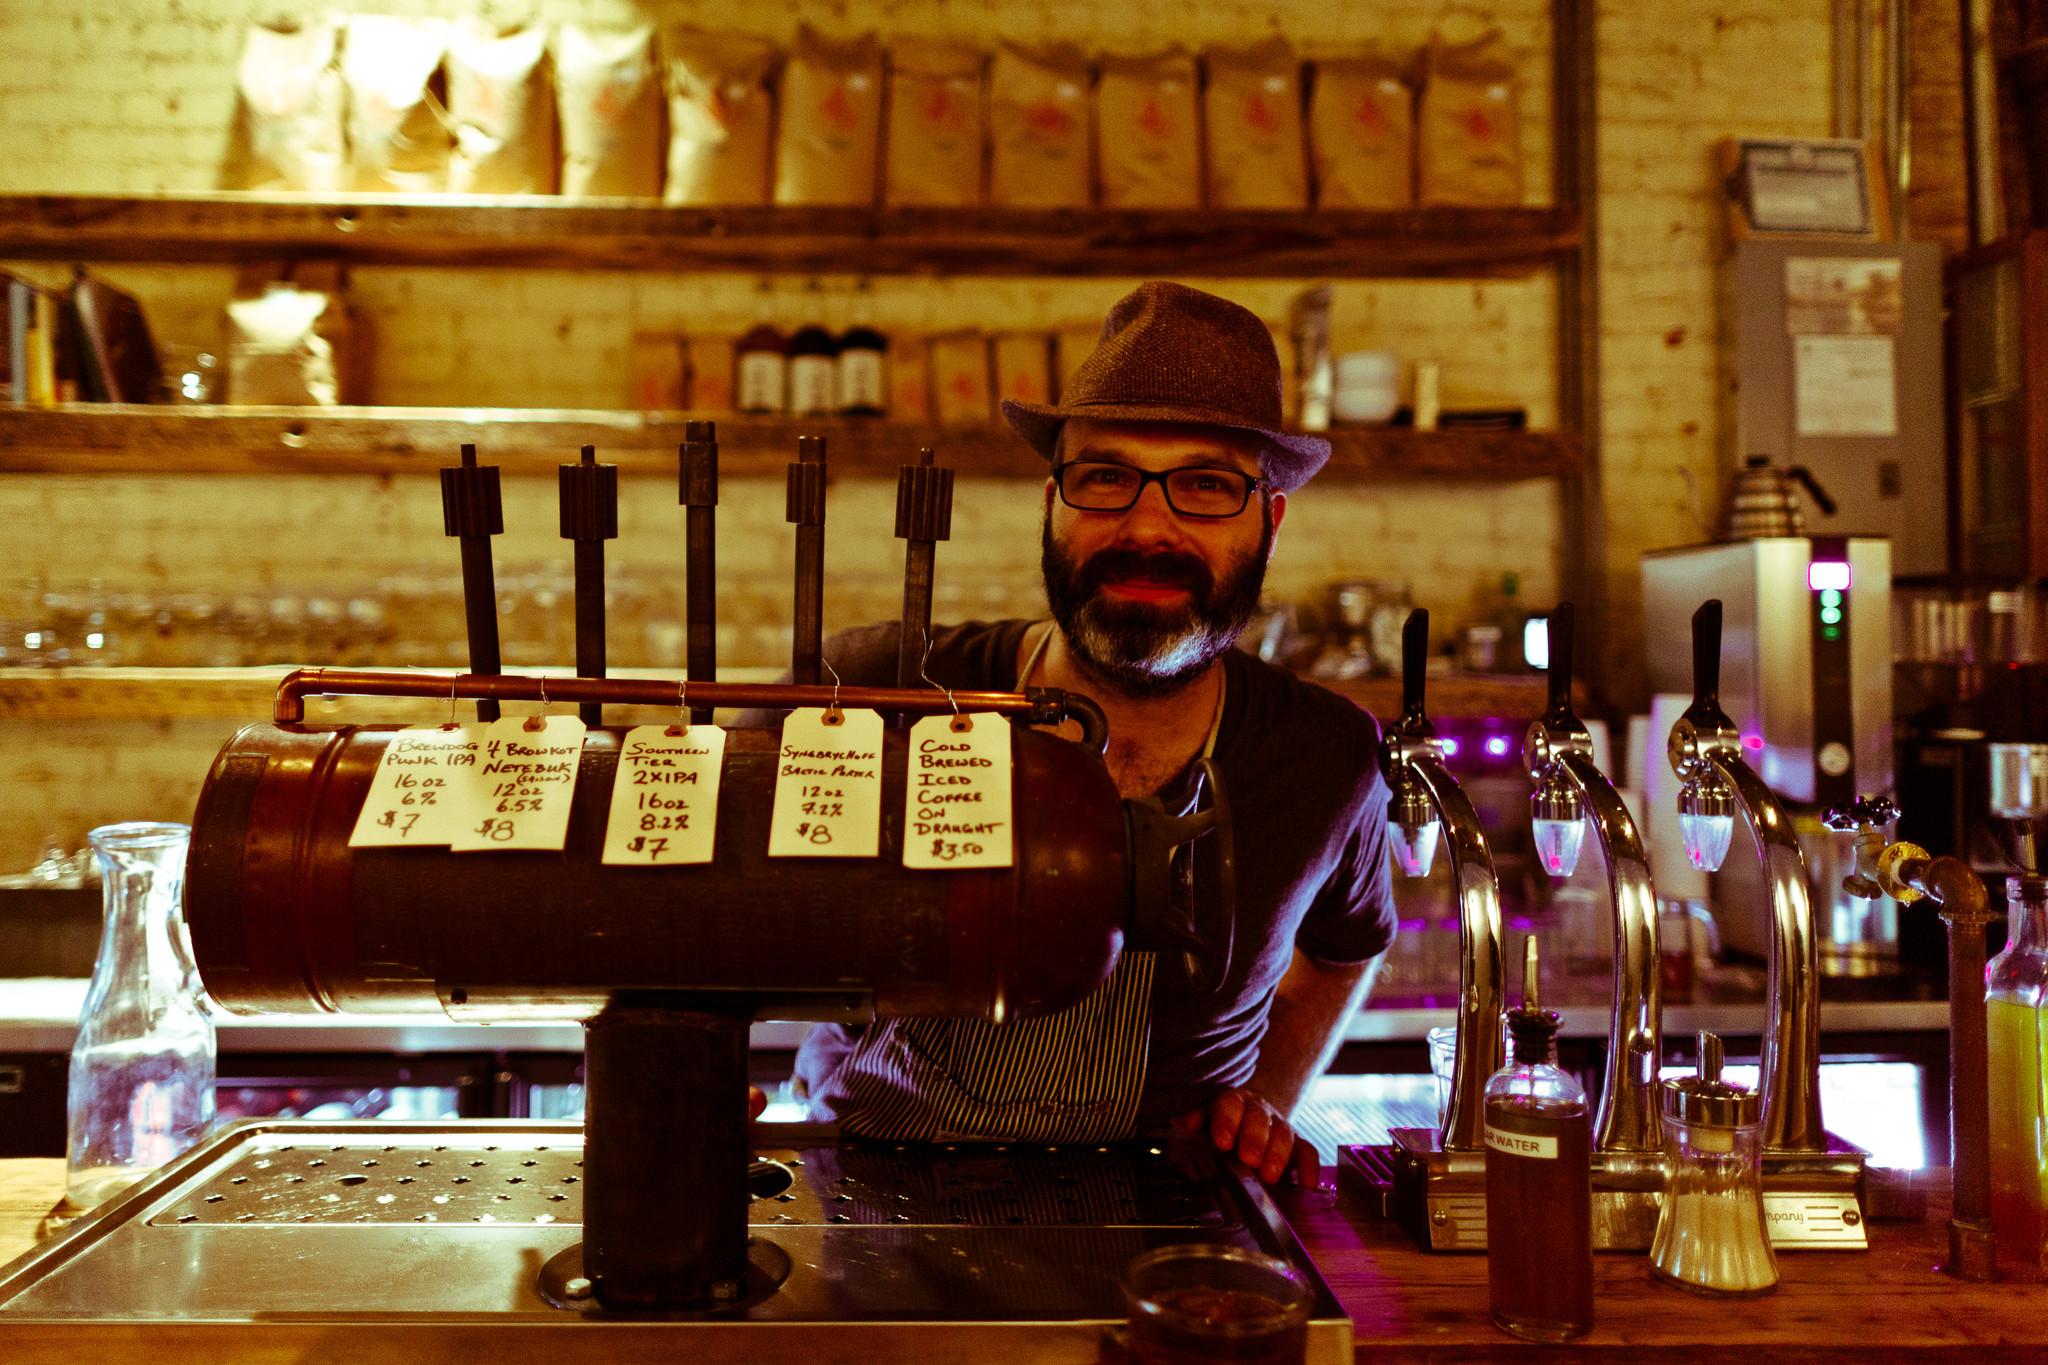 Owner Ben Sandler showing Coffee on Tap